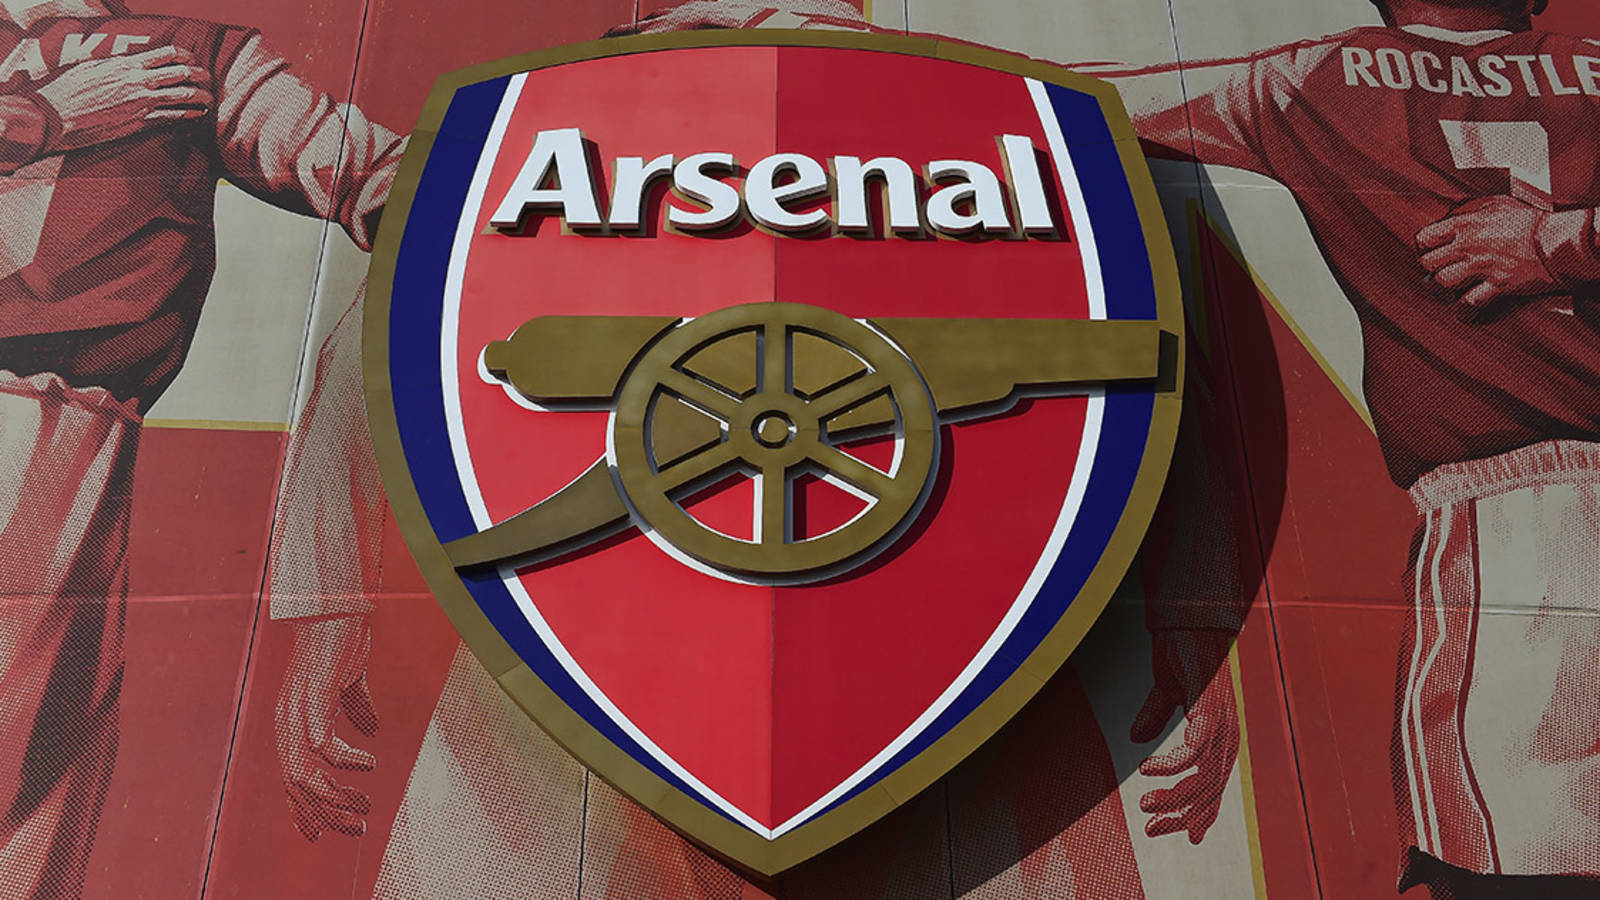 www.arsenal.com